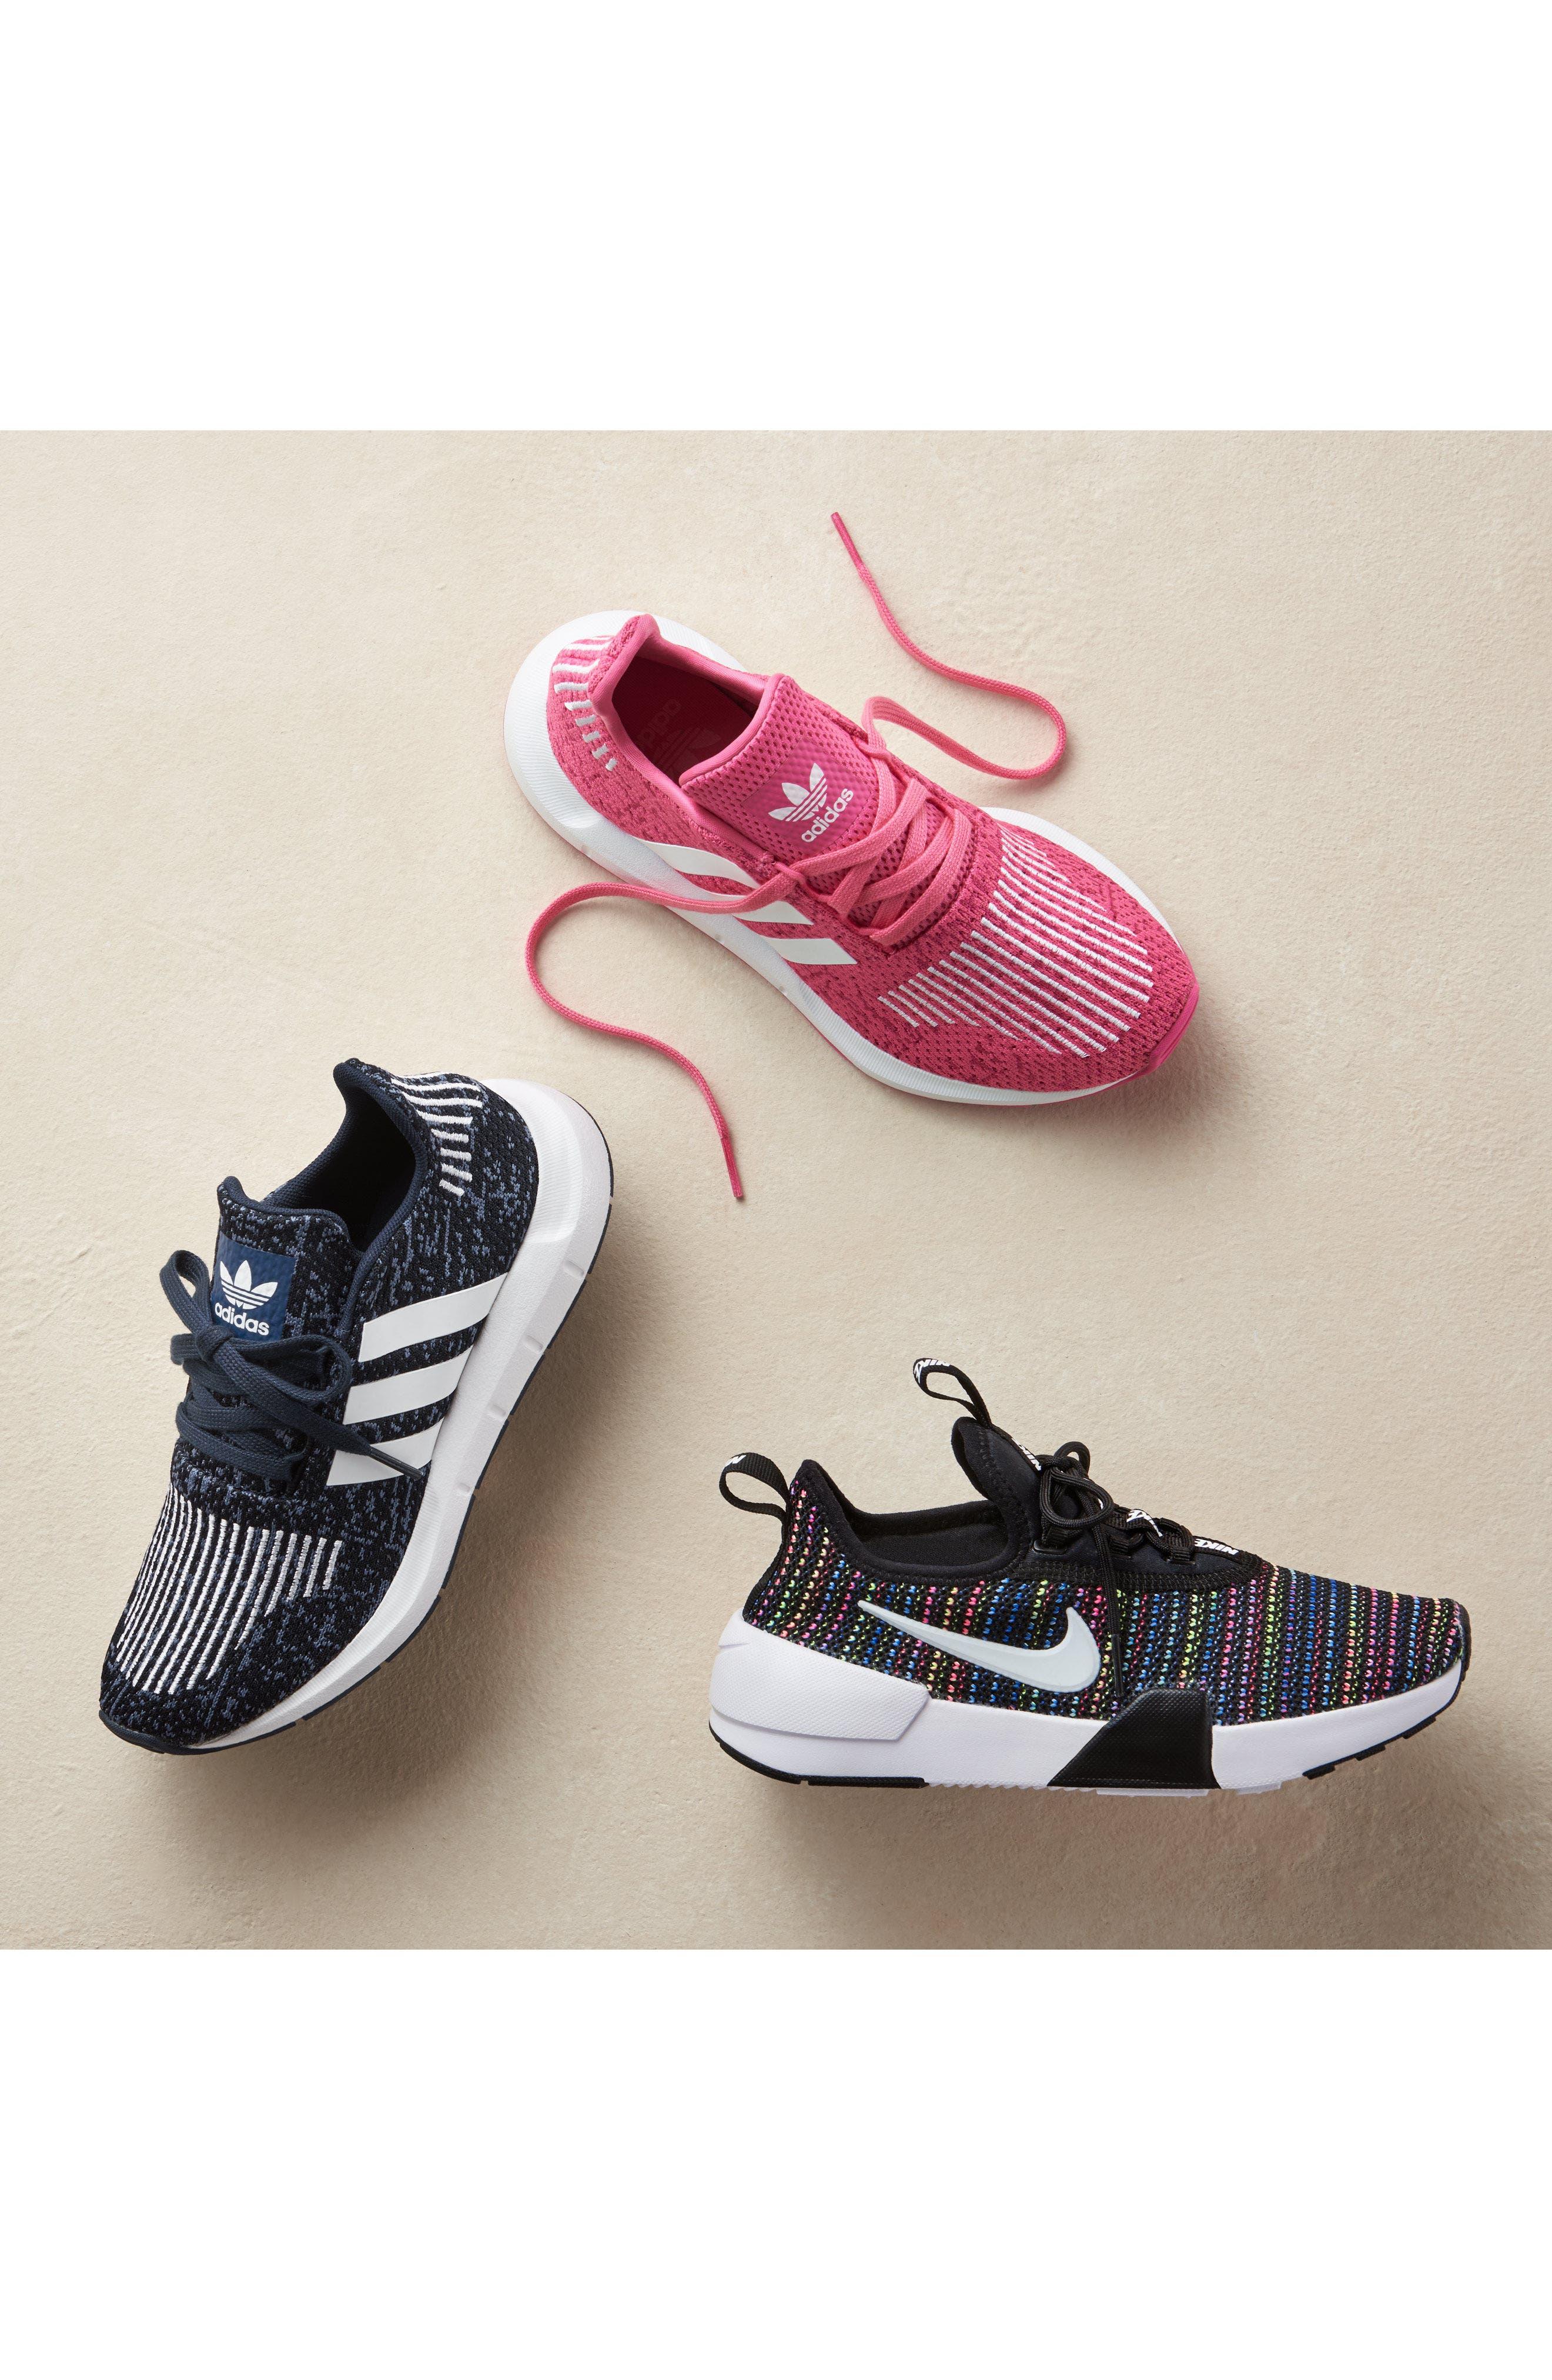 adidas swift run women nordstrom